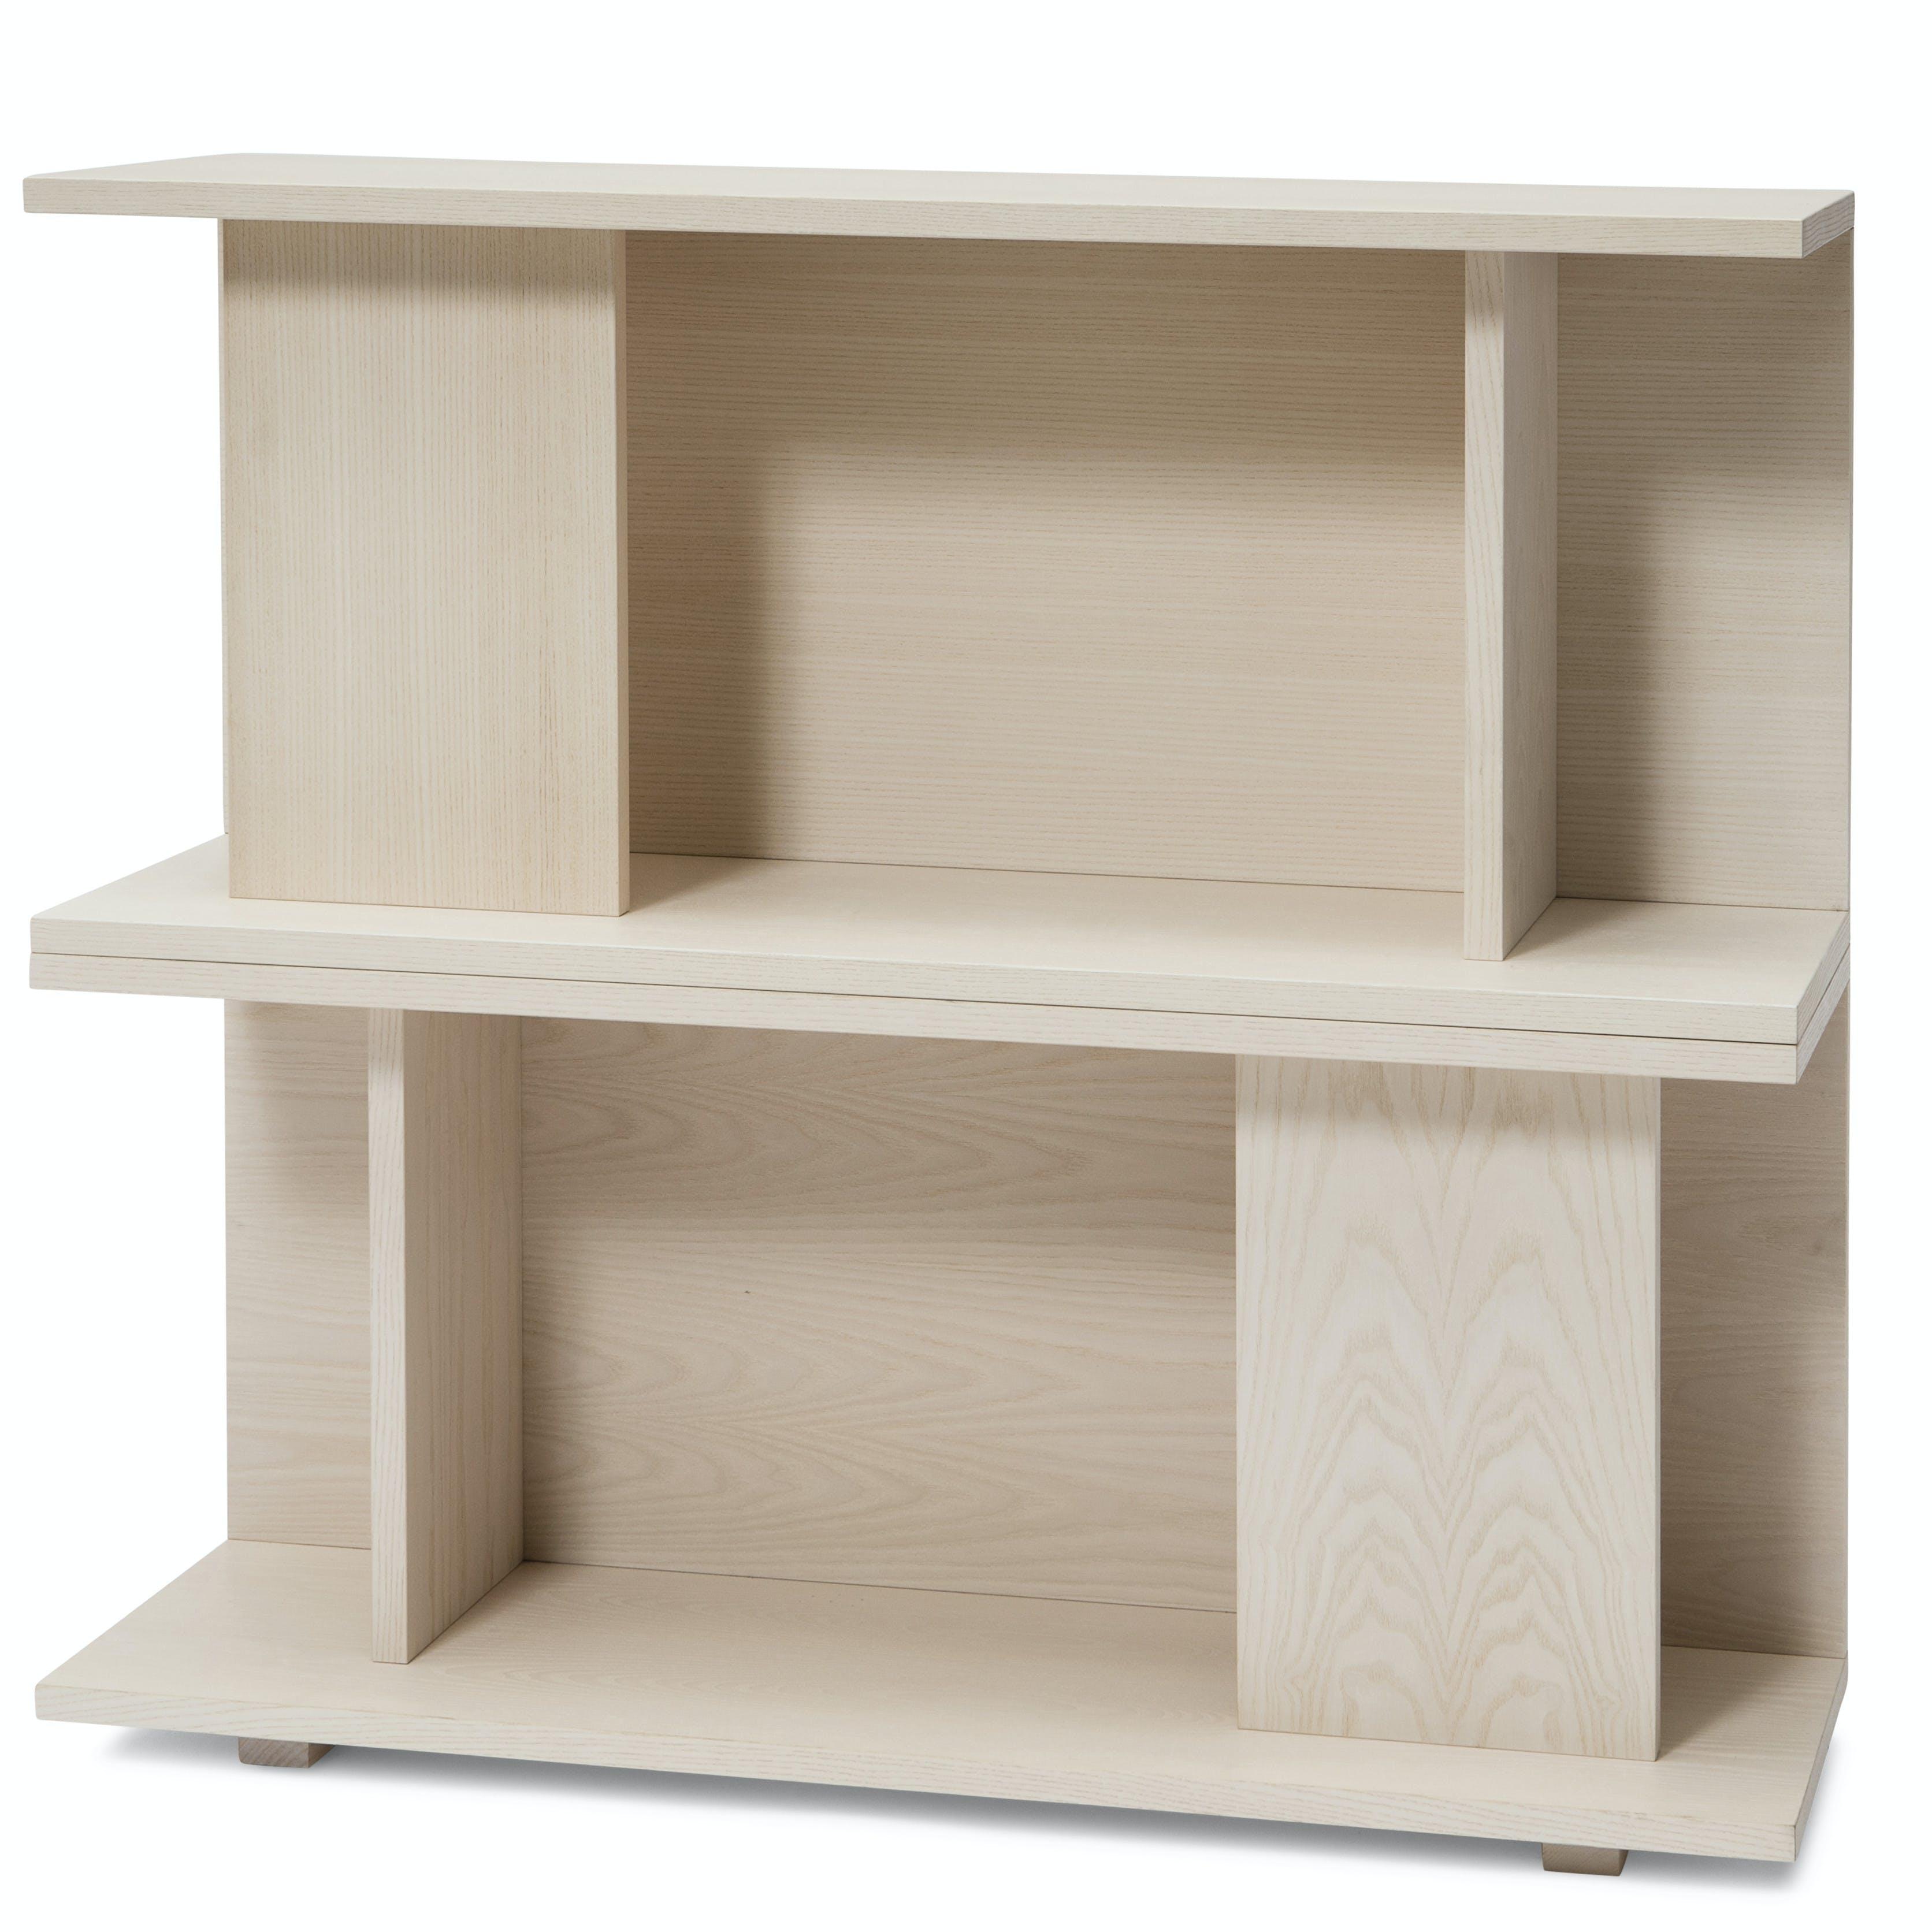 Linteloo-tall-hamptons-cabinet-haute-living